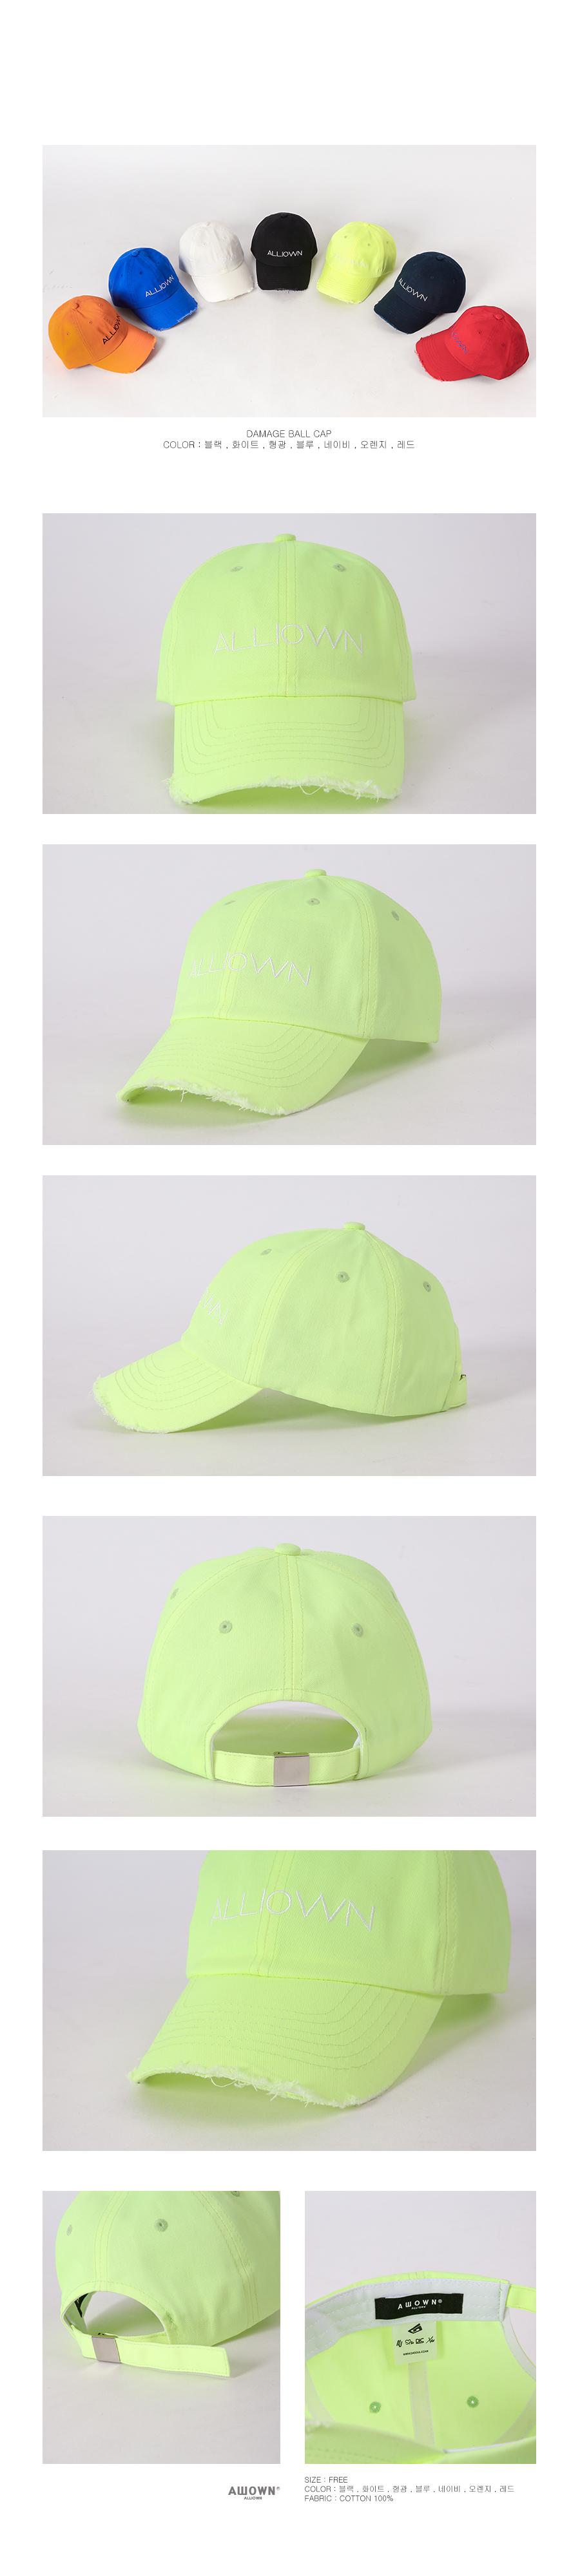 damageballcap_neon.jpg